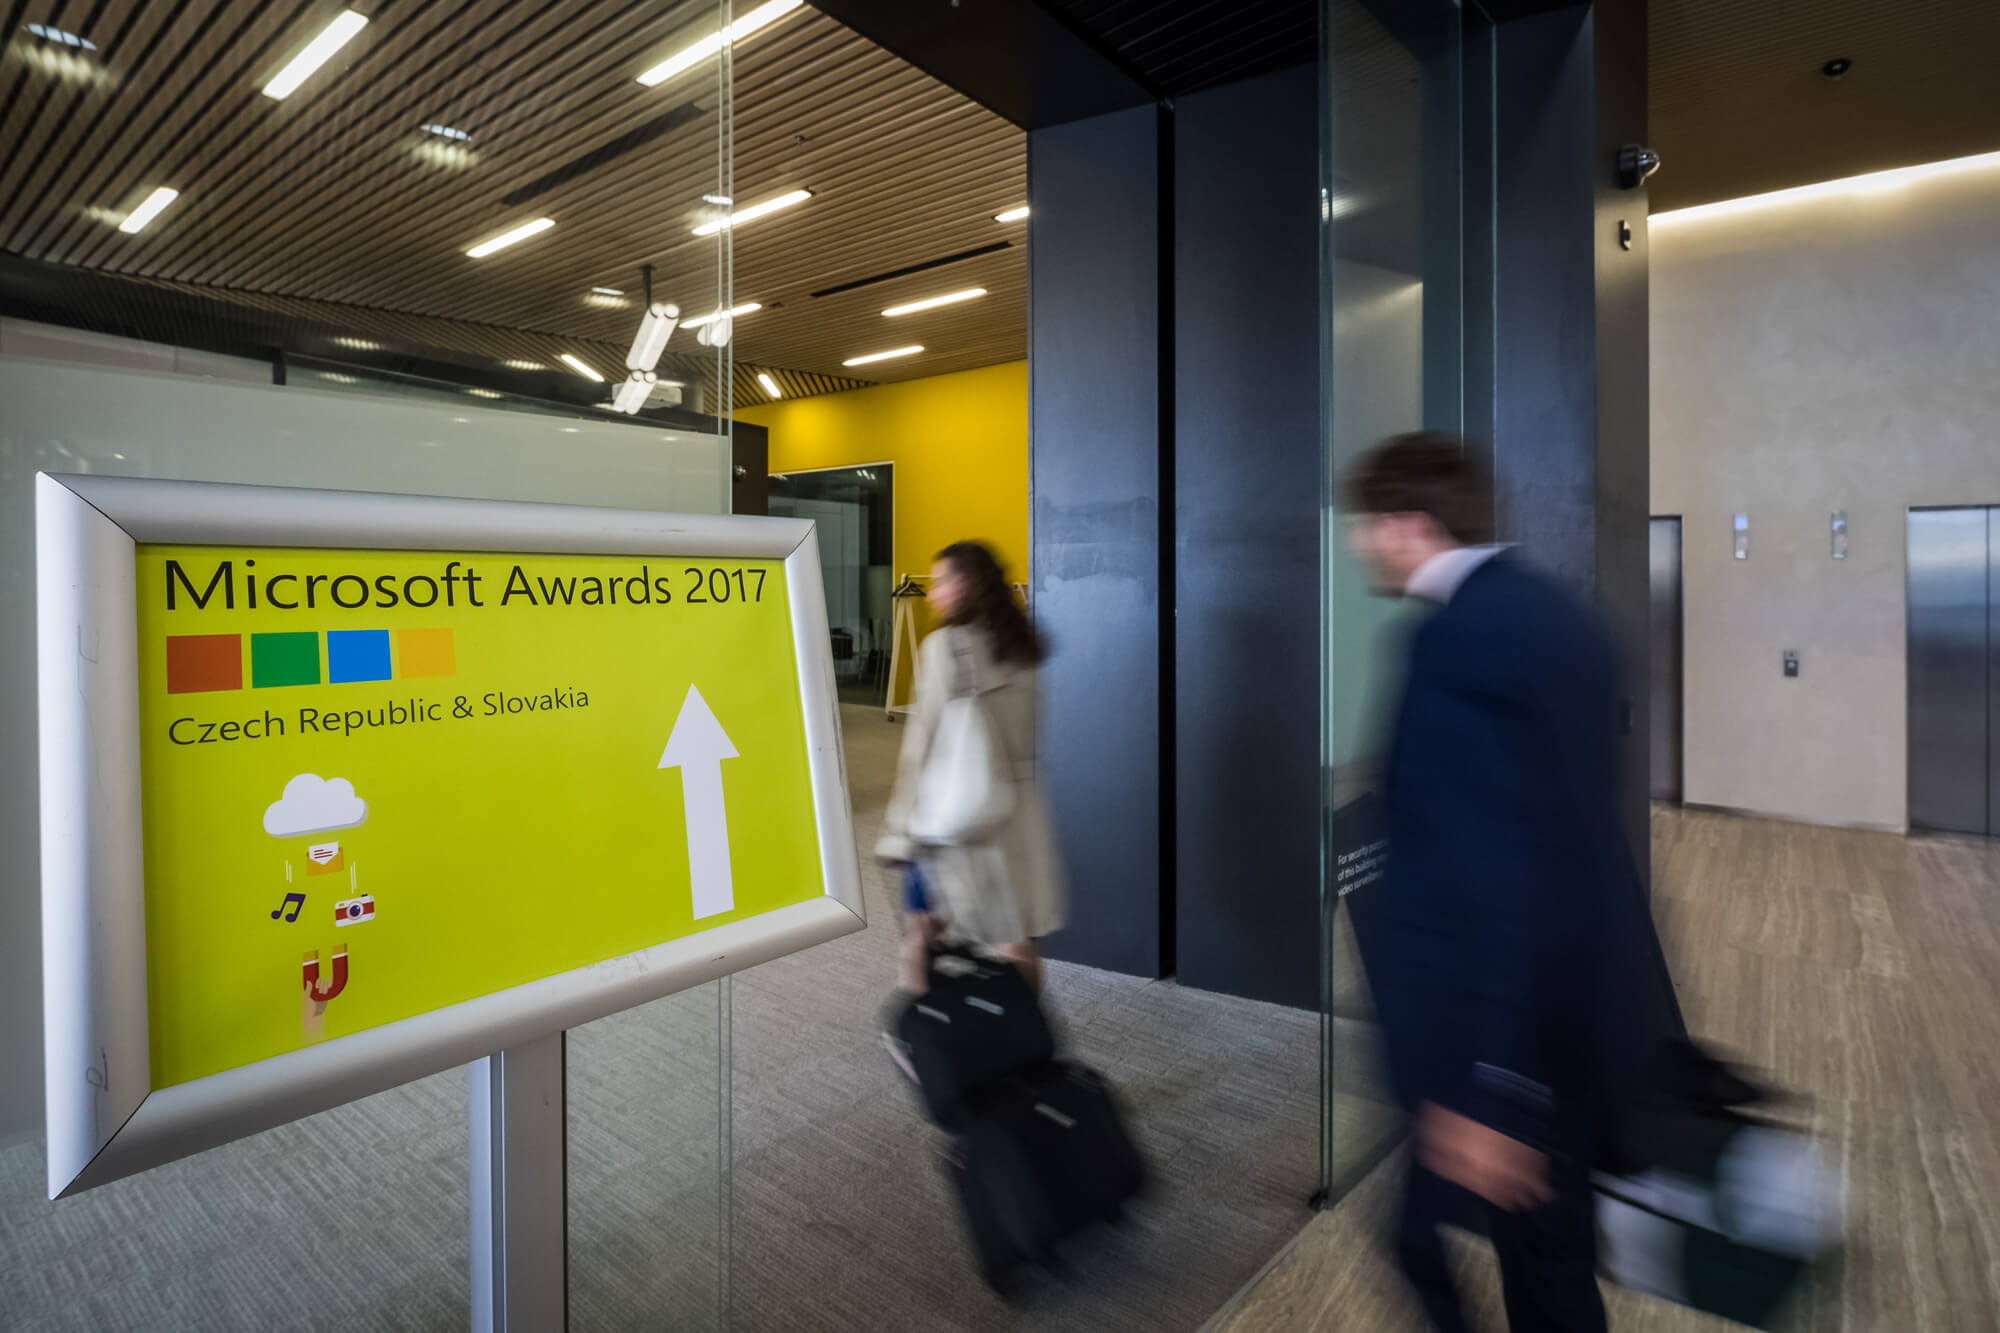 Microsoft Awards 2017